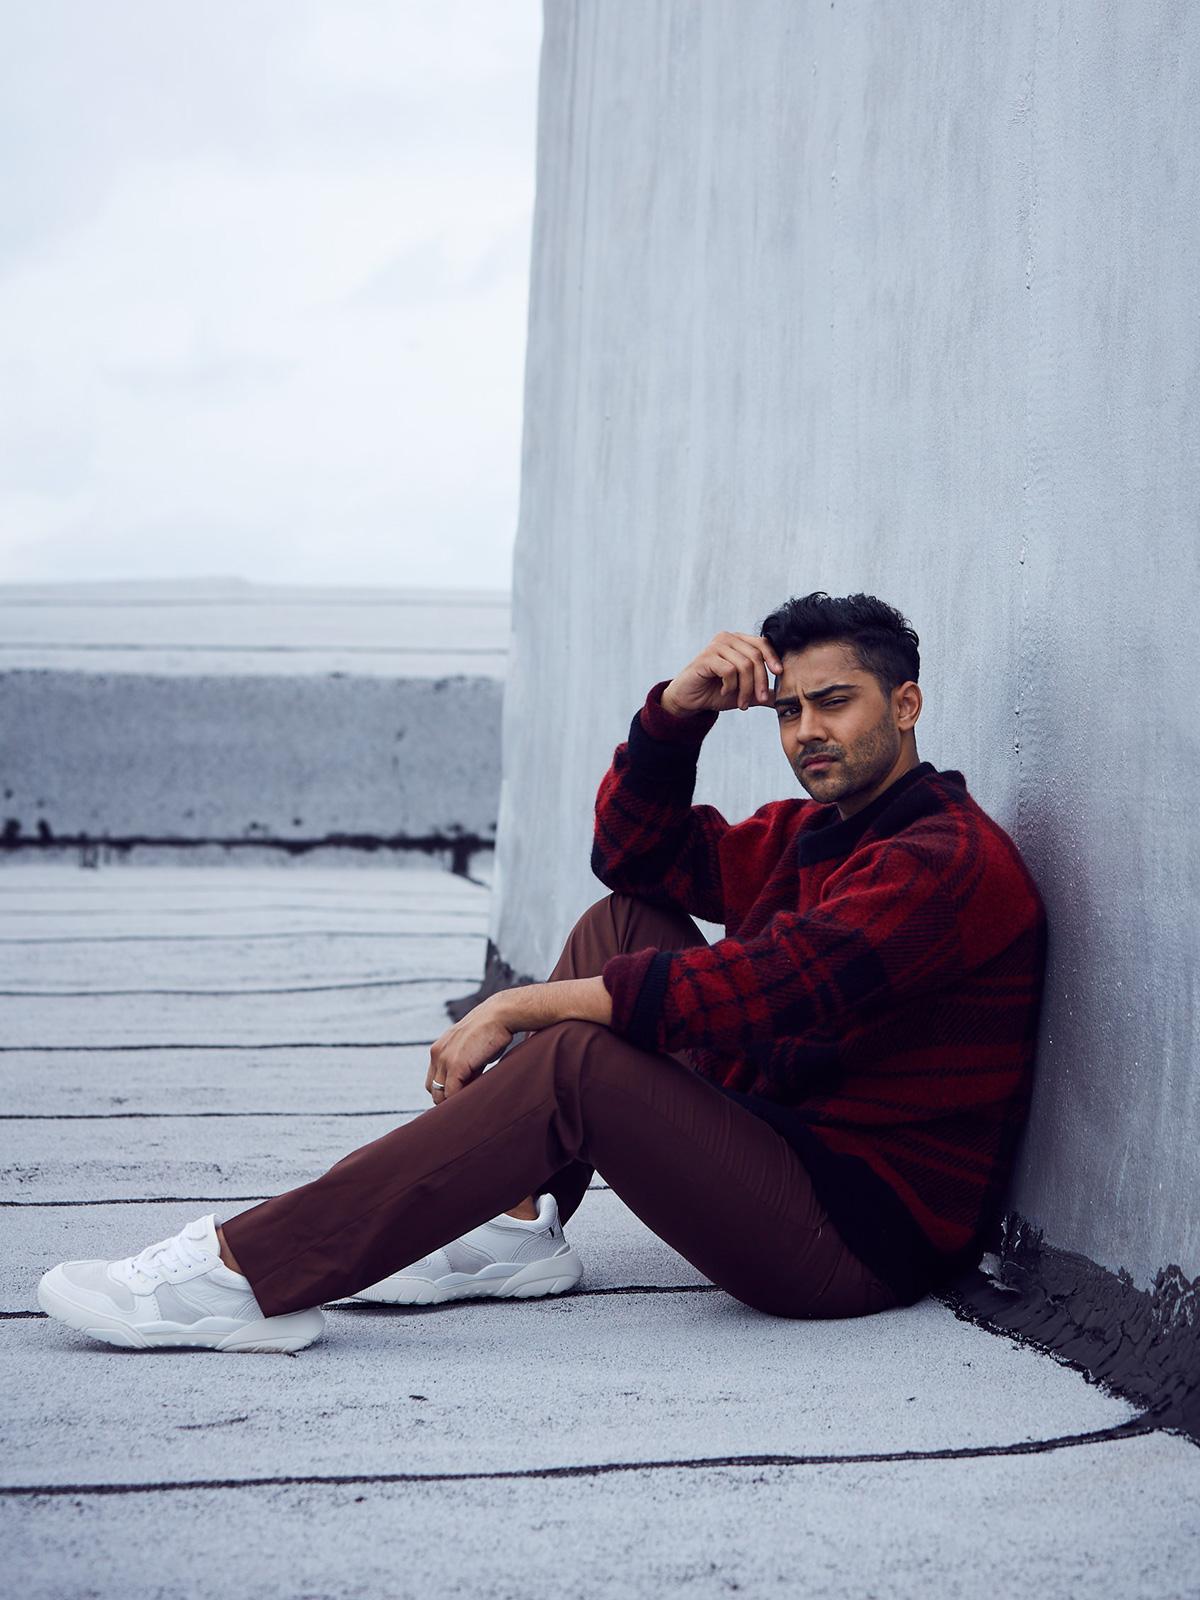 Sweater: Michael Kors, Shoes: Valentino